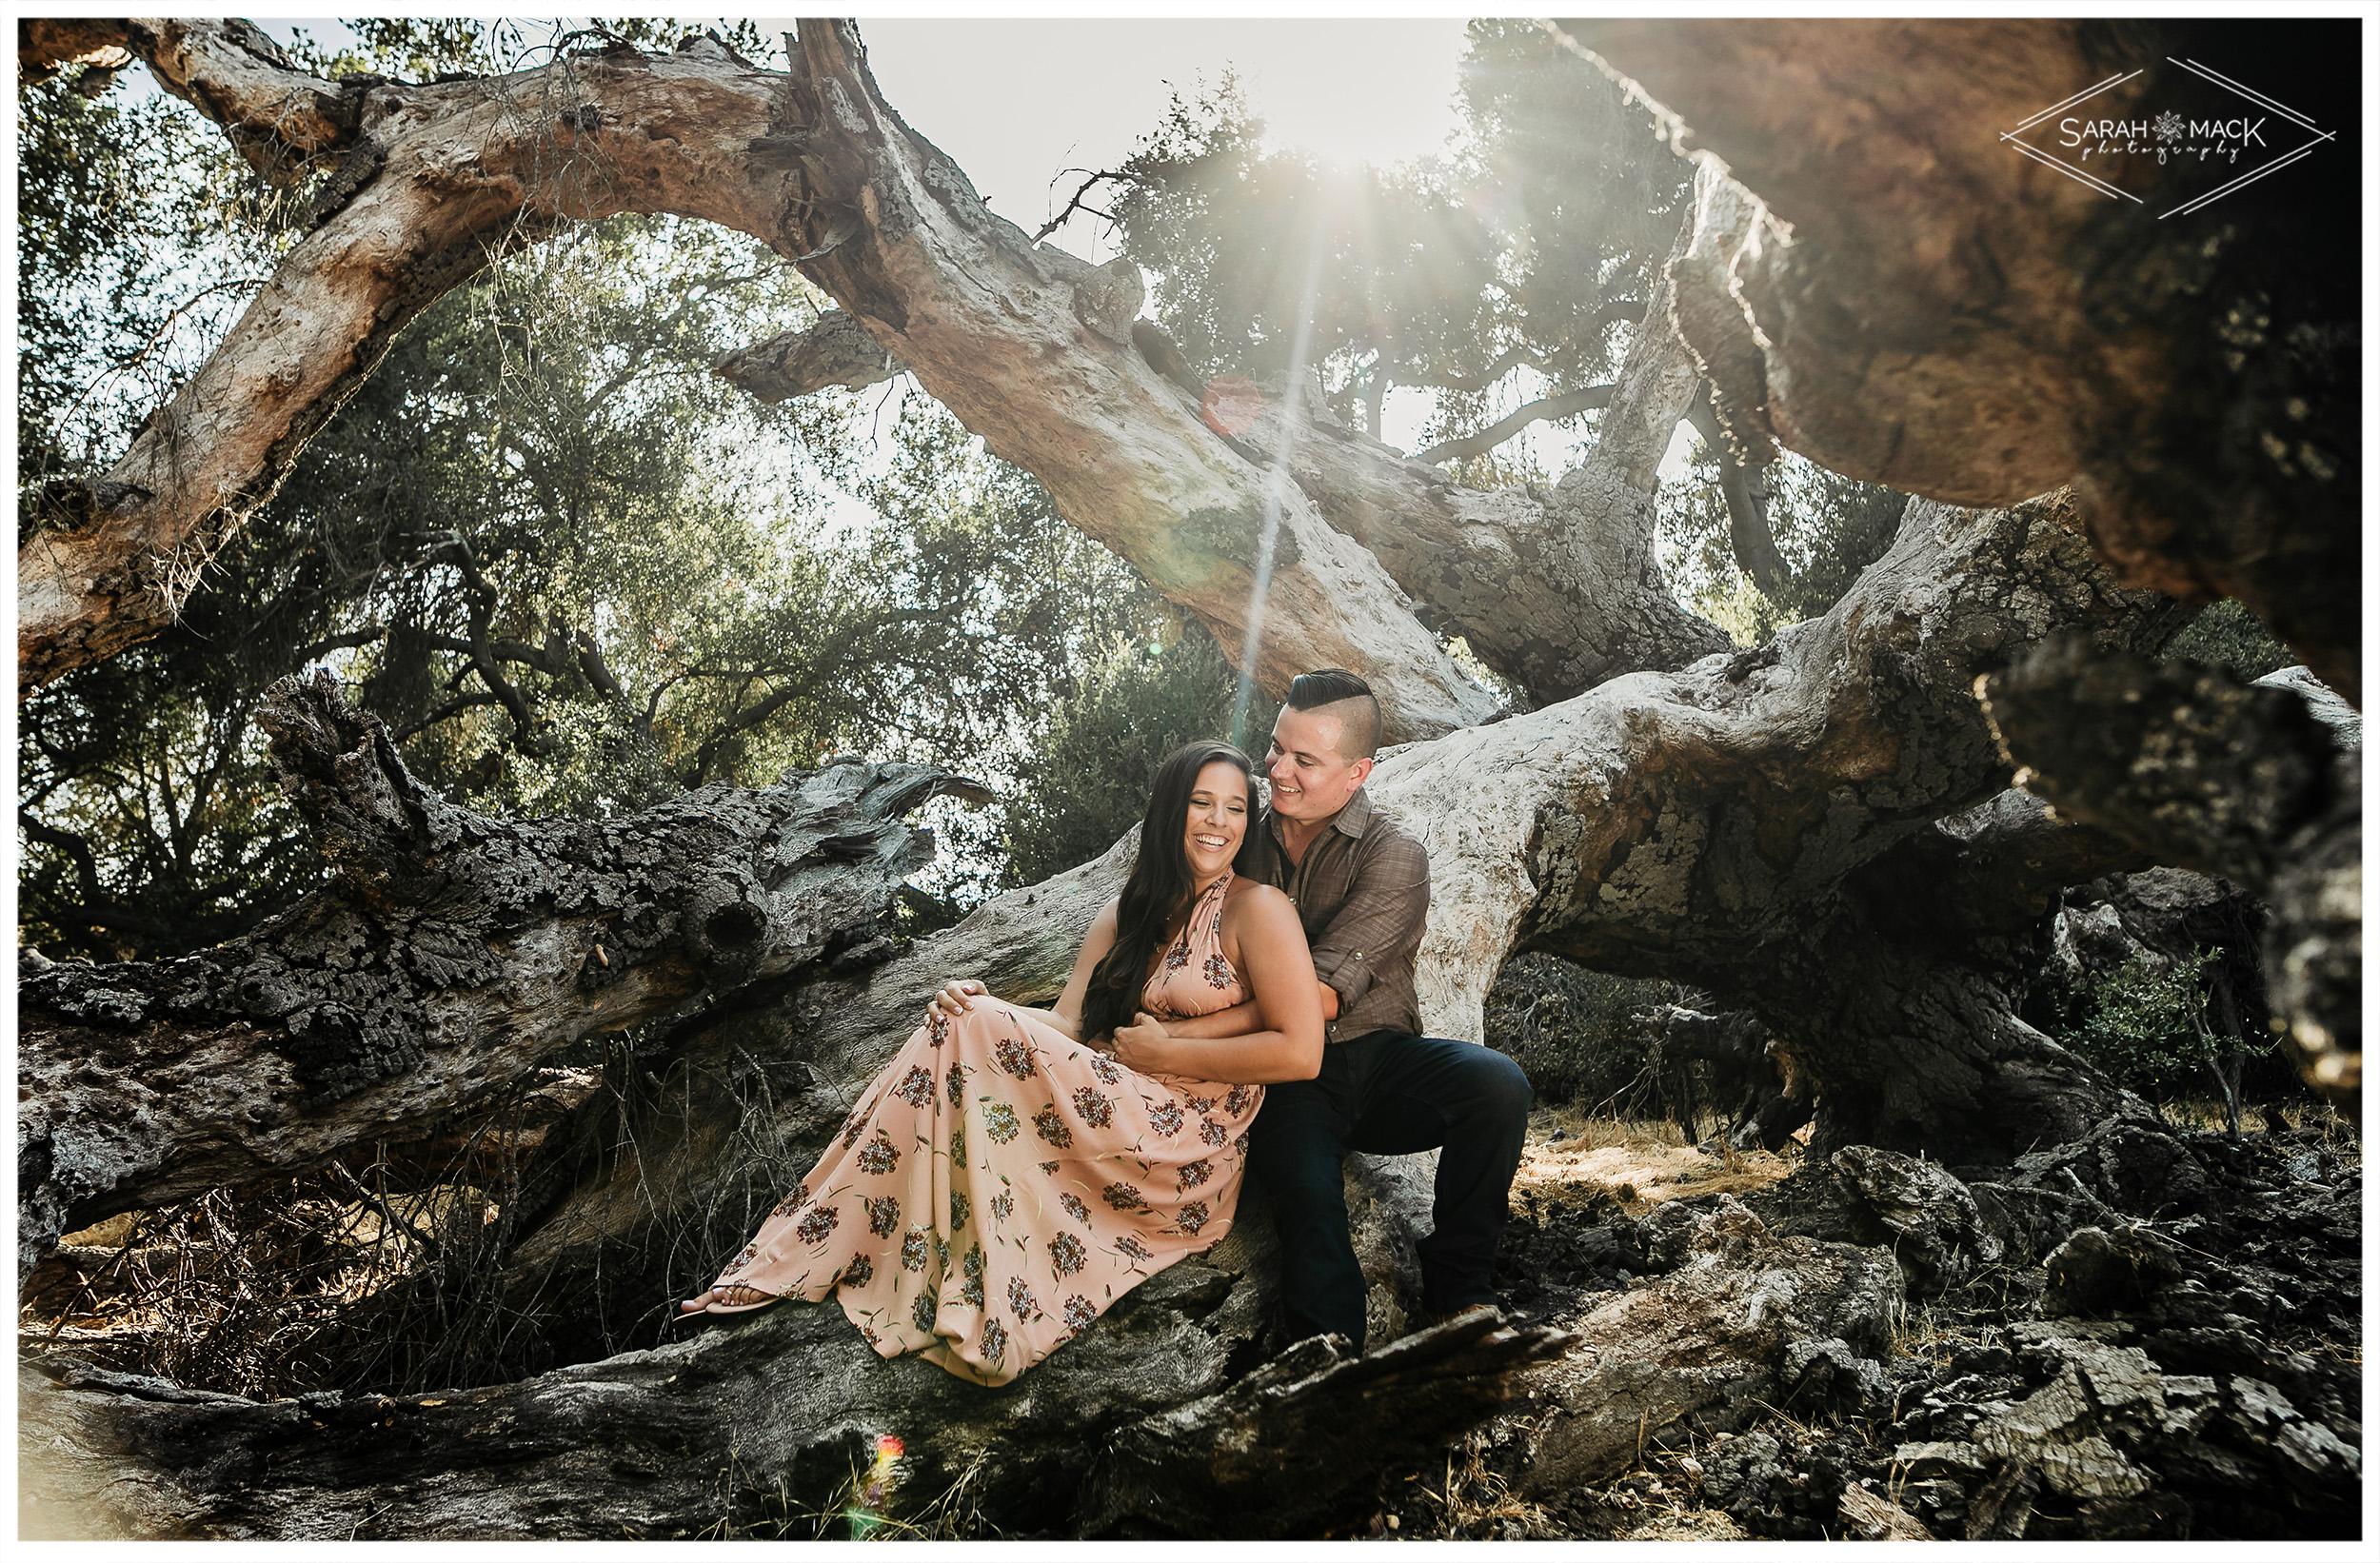 TM-Laguna-Beach-Orange-County-Engagement-Photography-4.jpg